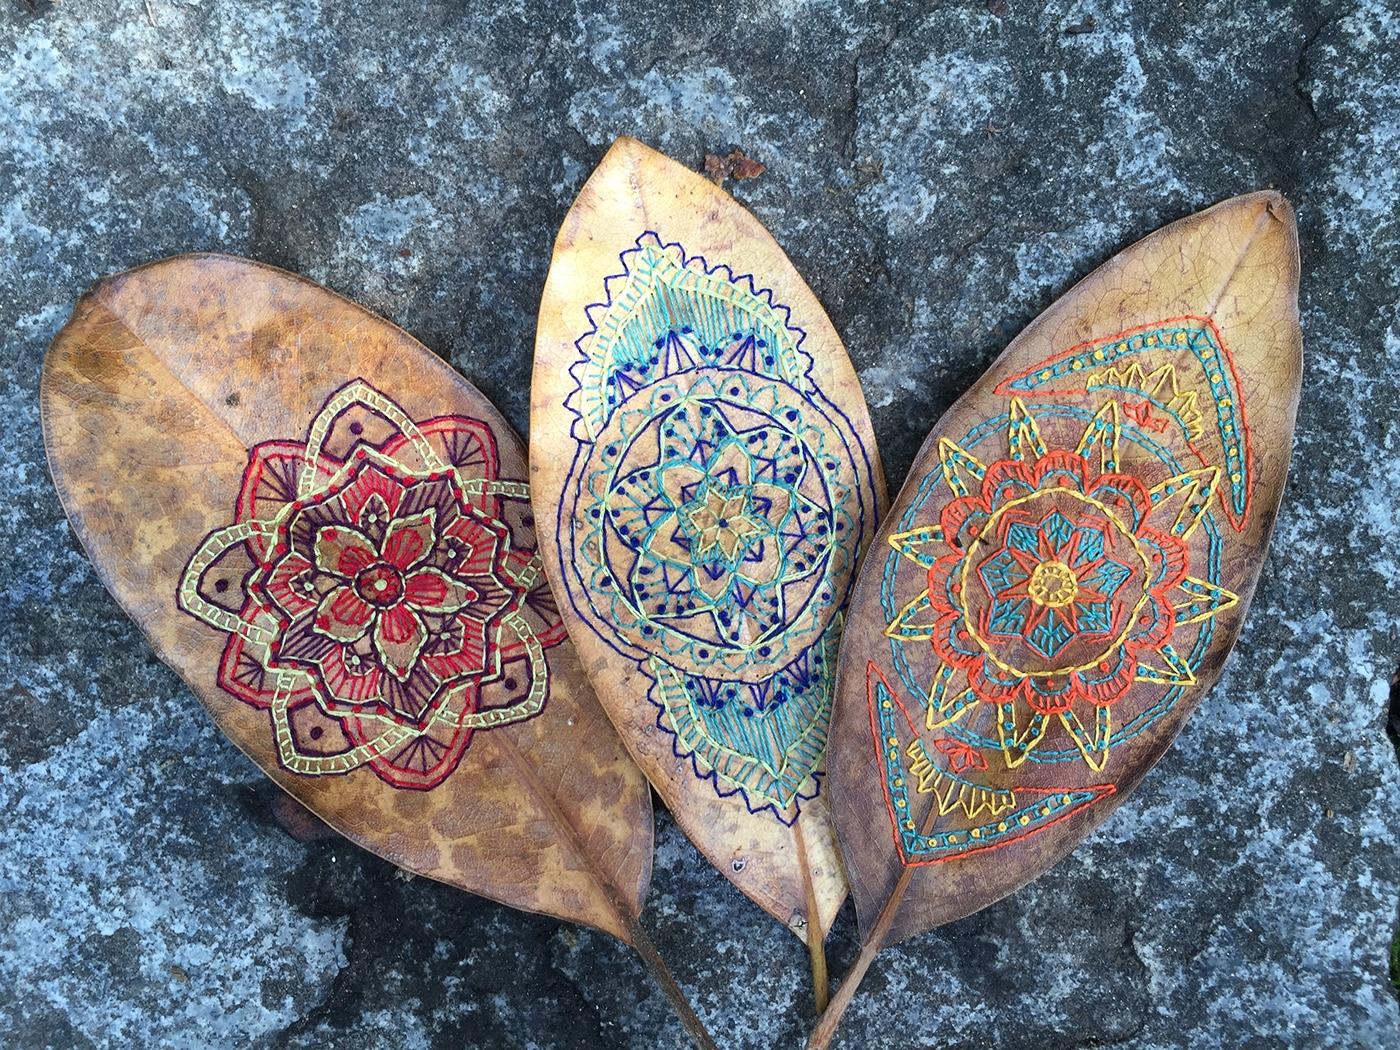 Embroidery Needlework leaf art embroidery design design fiber art textile art natural process Mandala Art detailed art